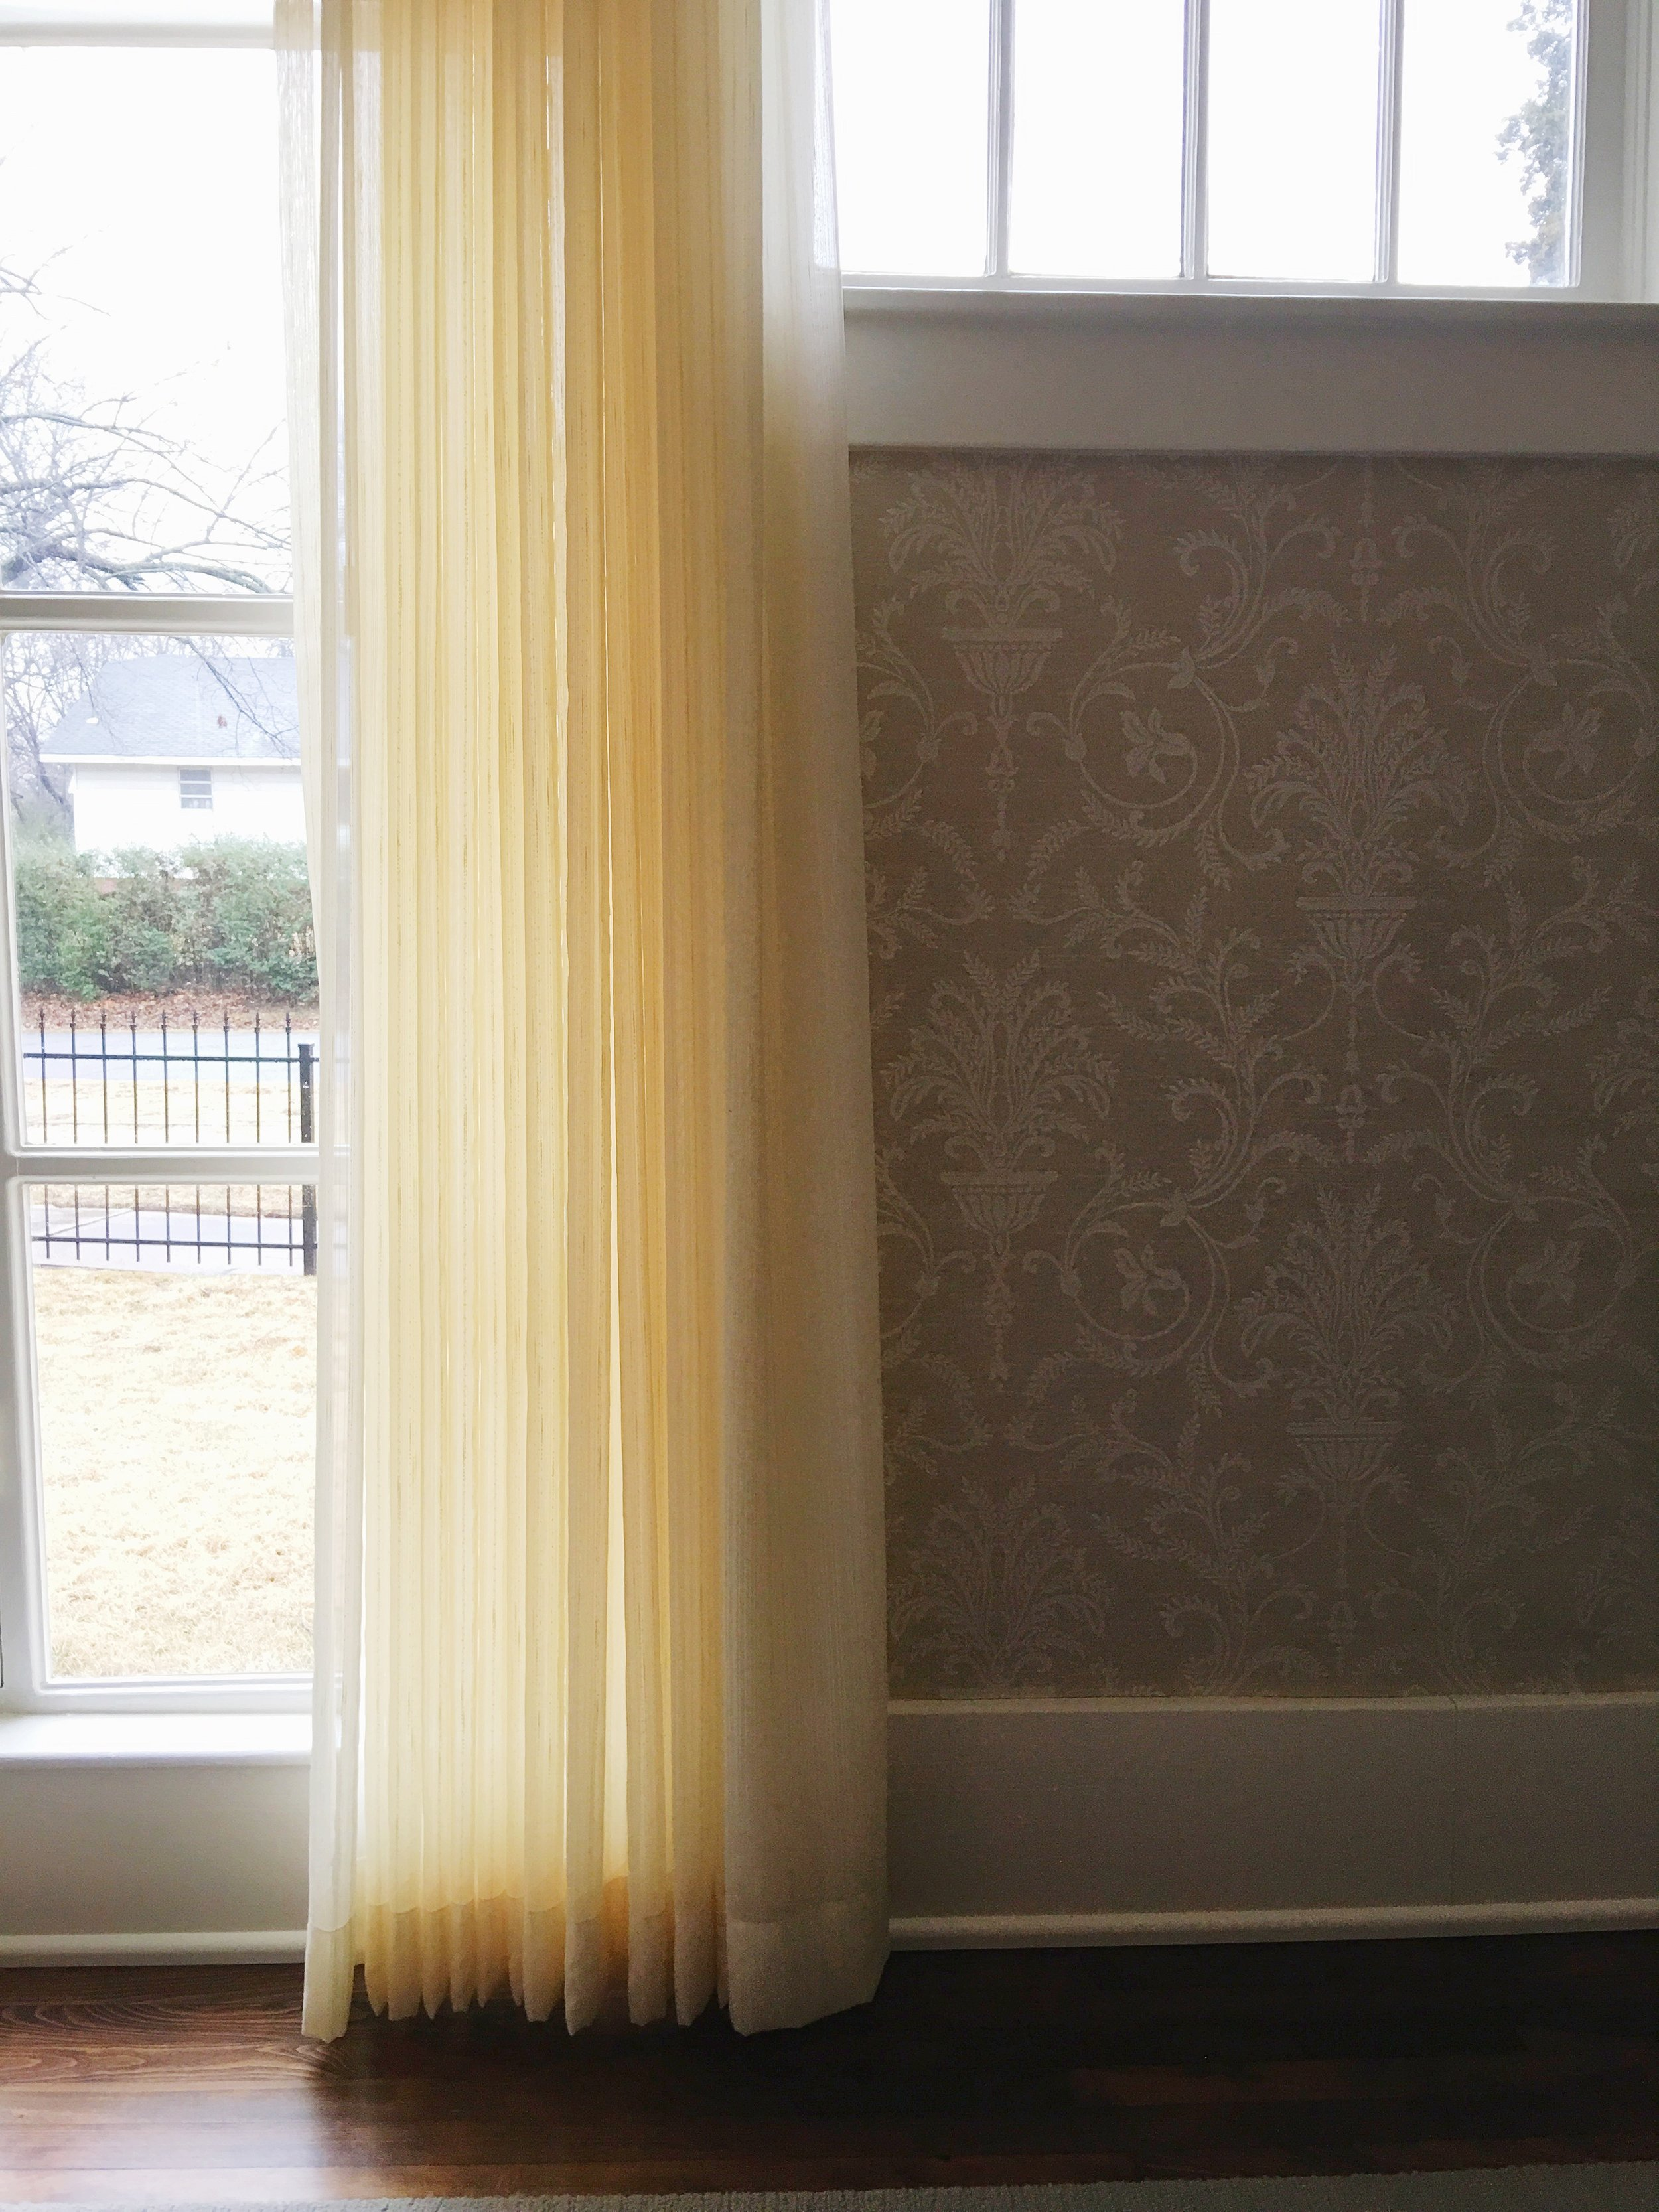 sharpe-house-wallpaper-window